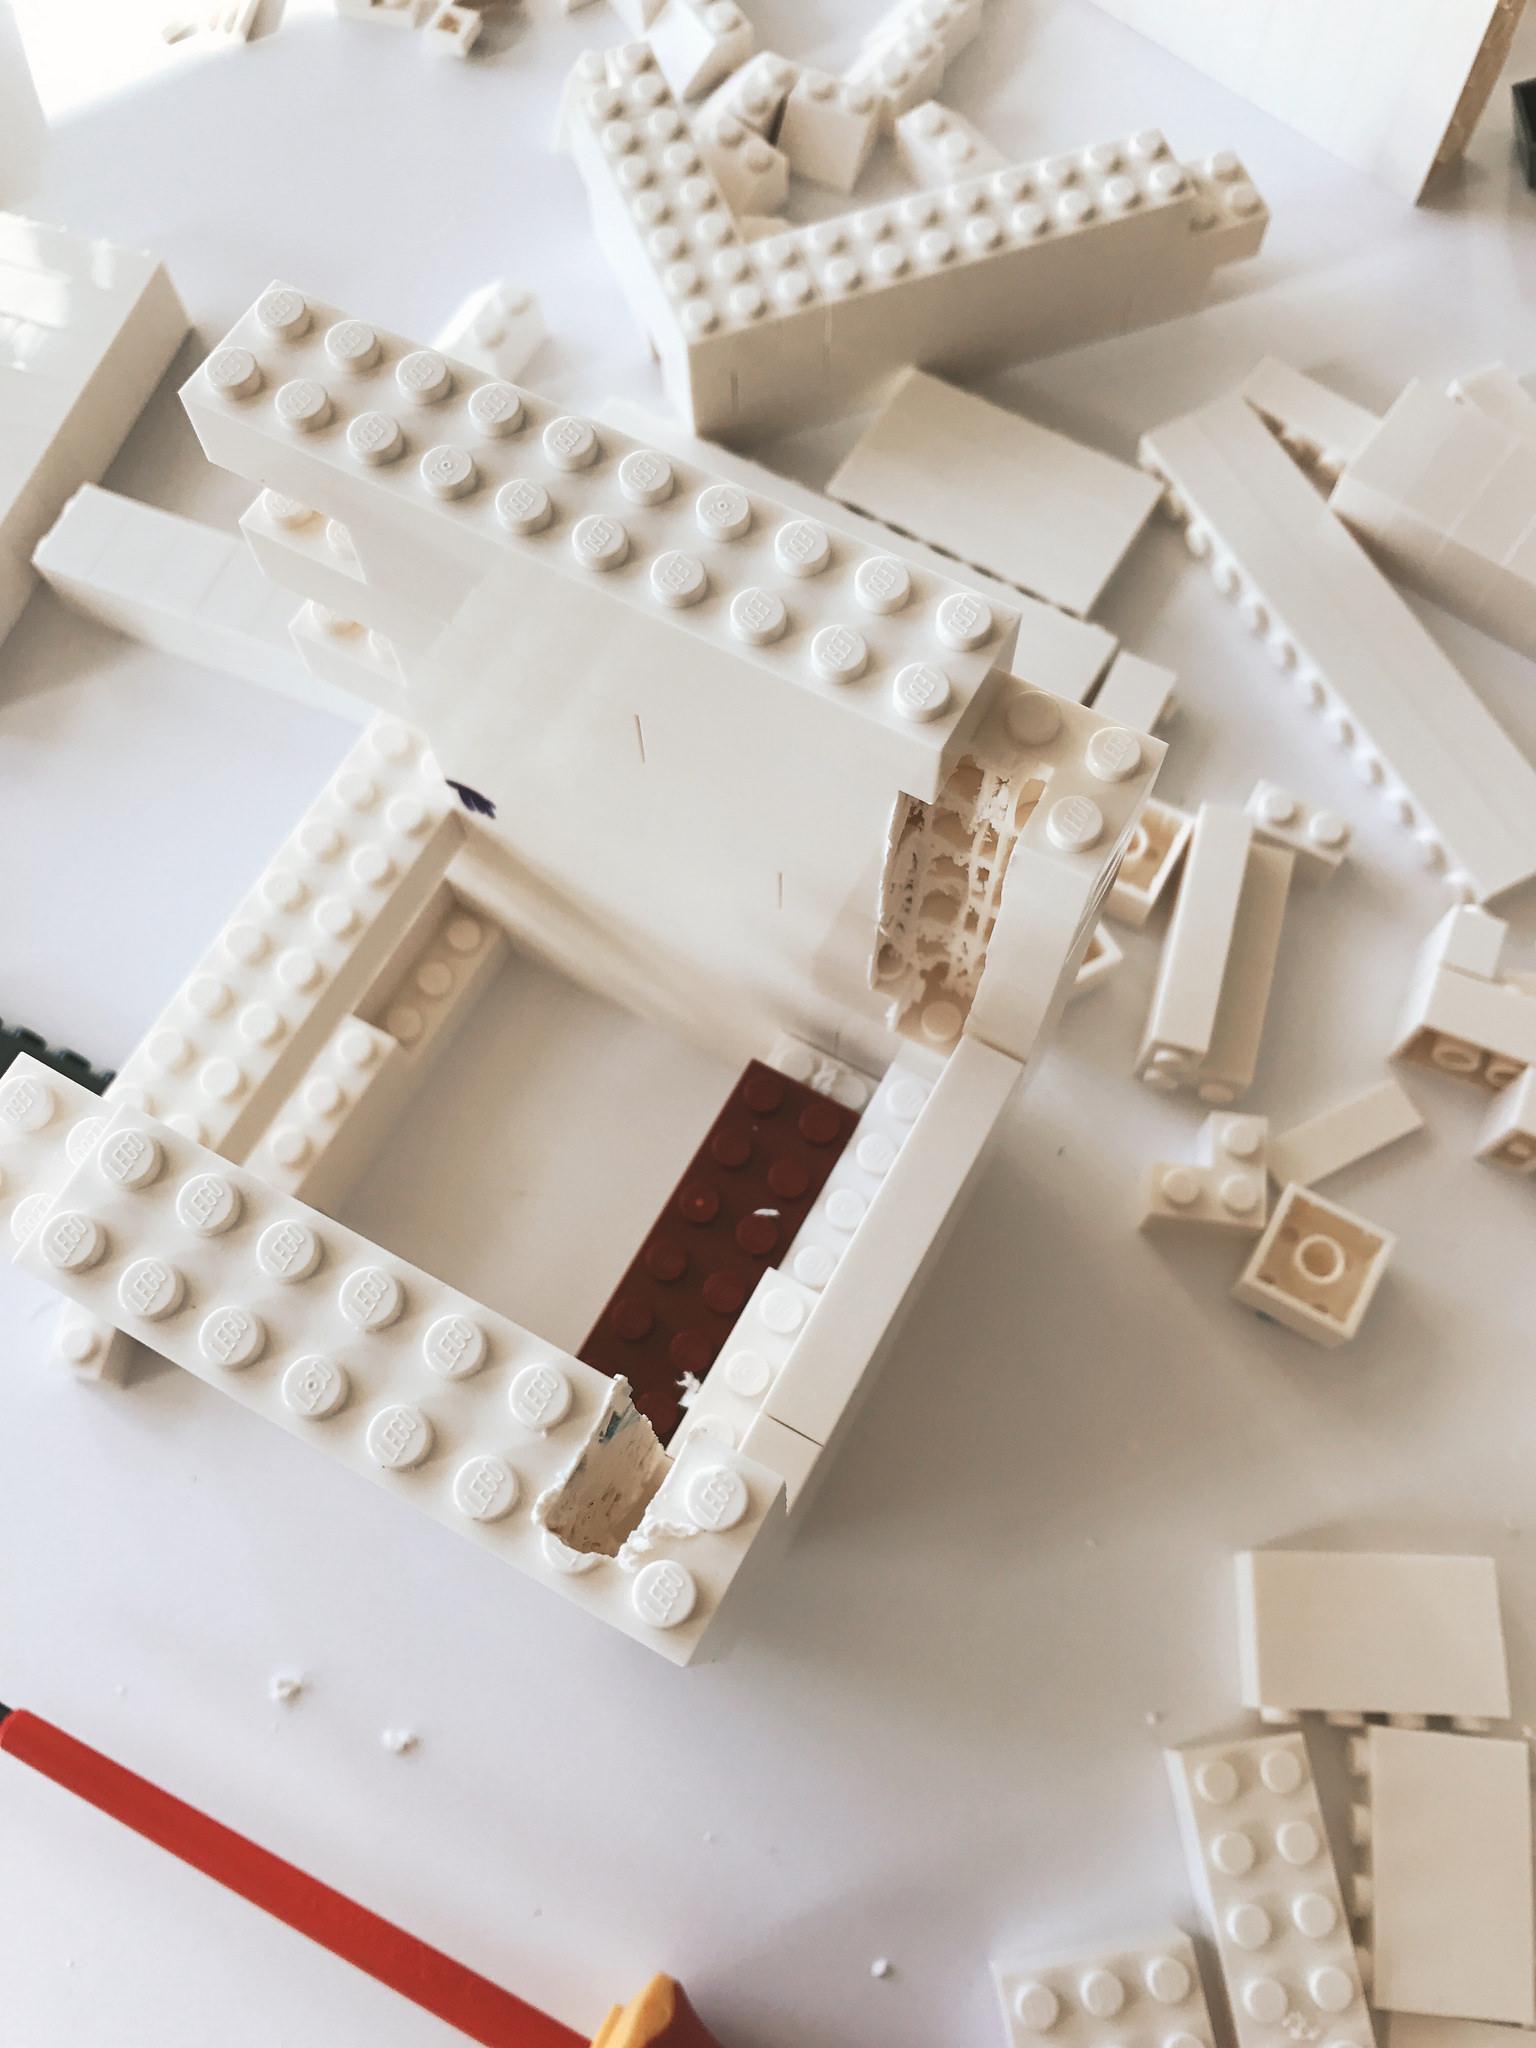 lego-mac-classic-001